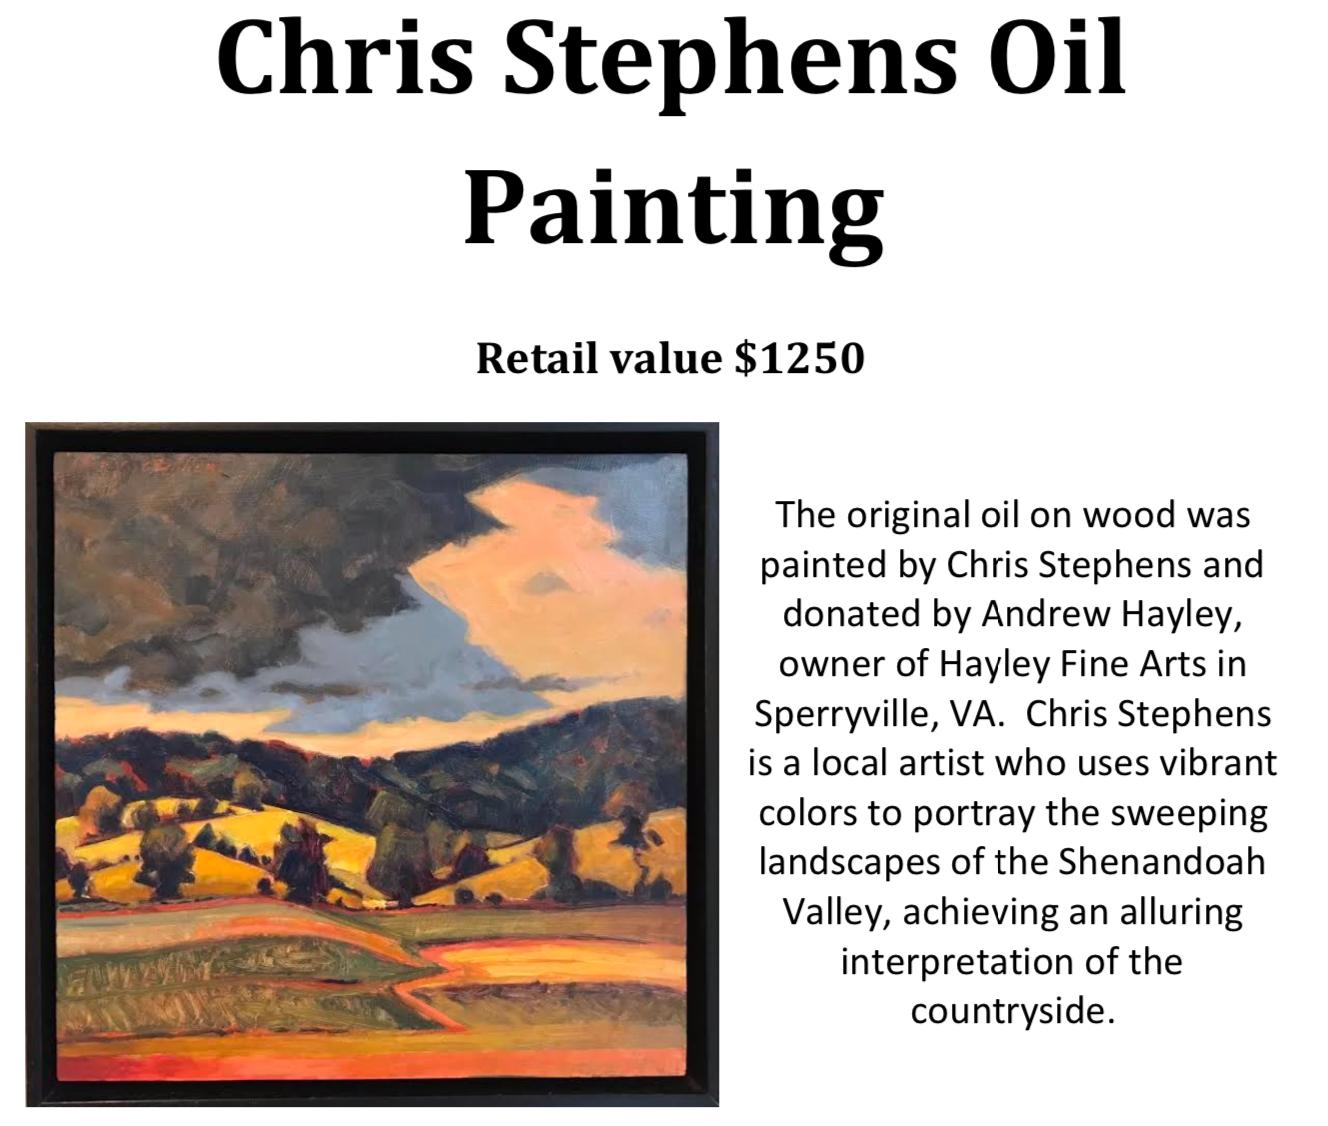 Chris Stephens Oil Painting.png